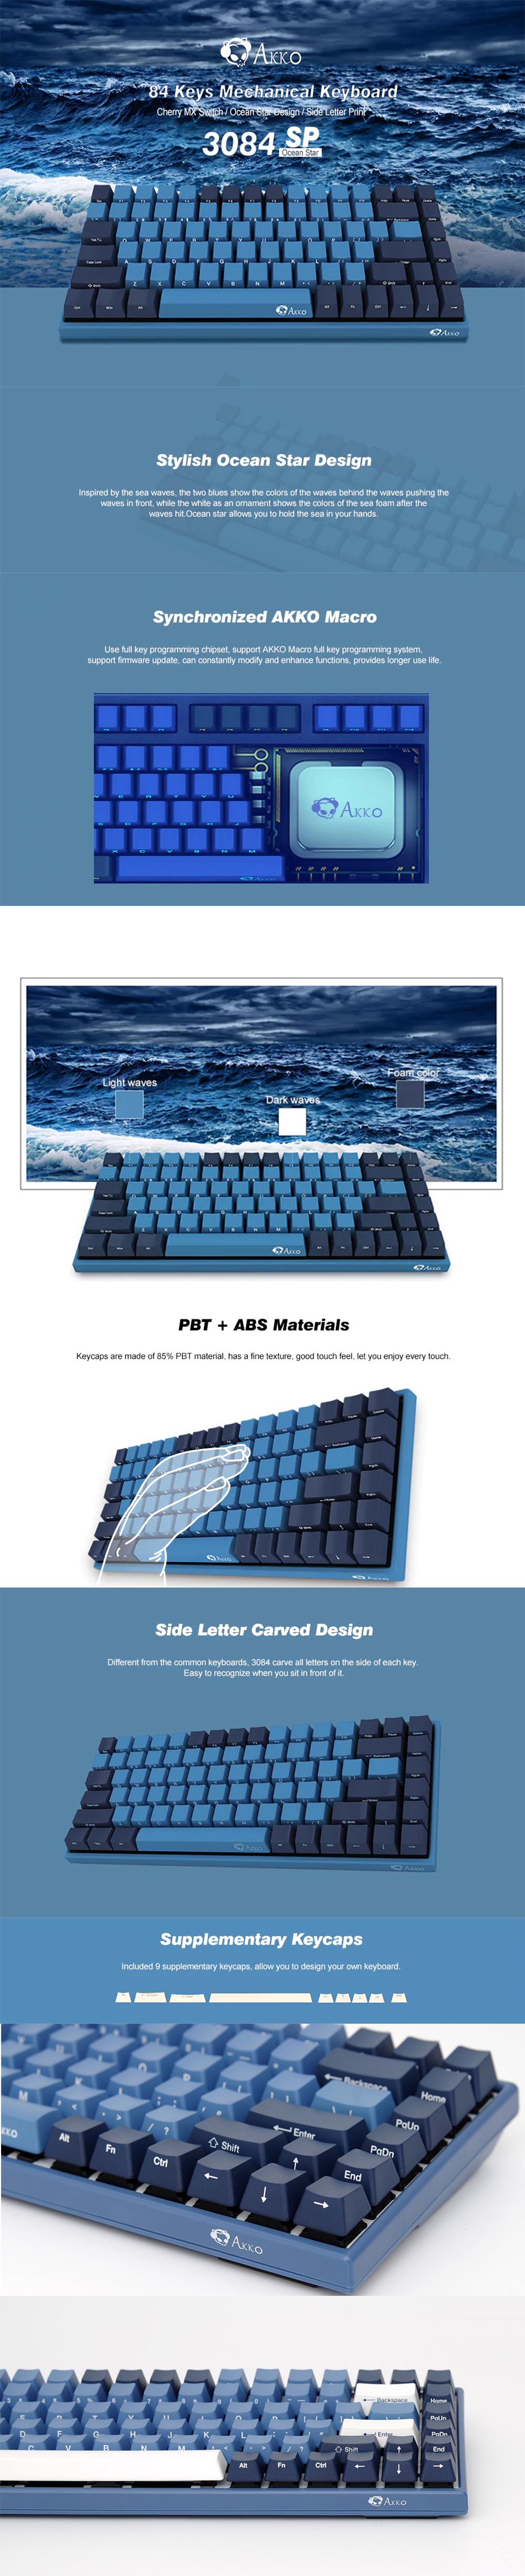 AKKO 3084 SP Ocean Star 84 Keys PBT Keycap Cherry Switch USB 2.0 Type-C Wired Side Letter Caverd Design Mechanical Gaming Keyboard 9